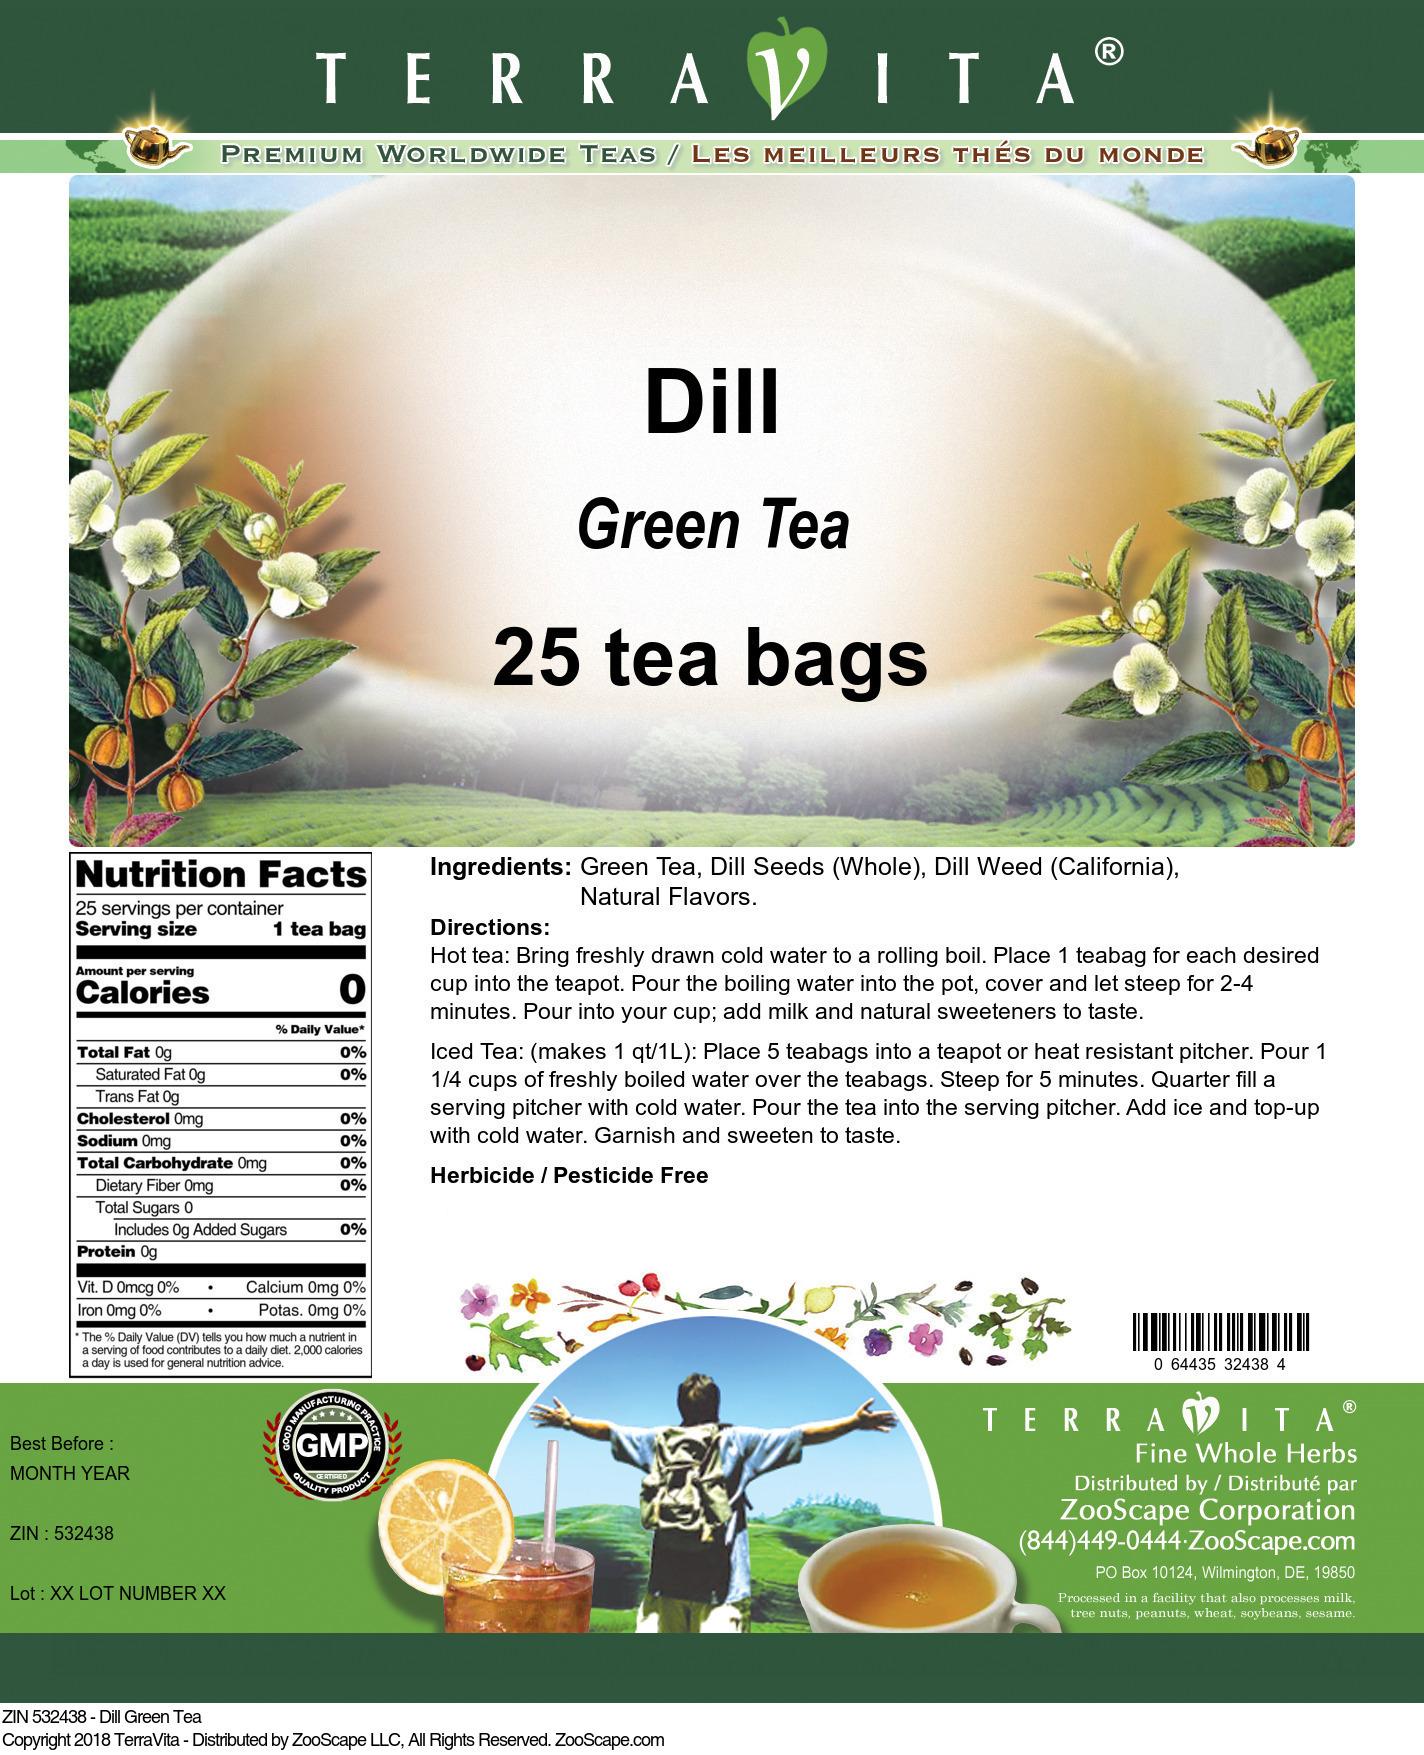 Dill Green Tea